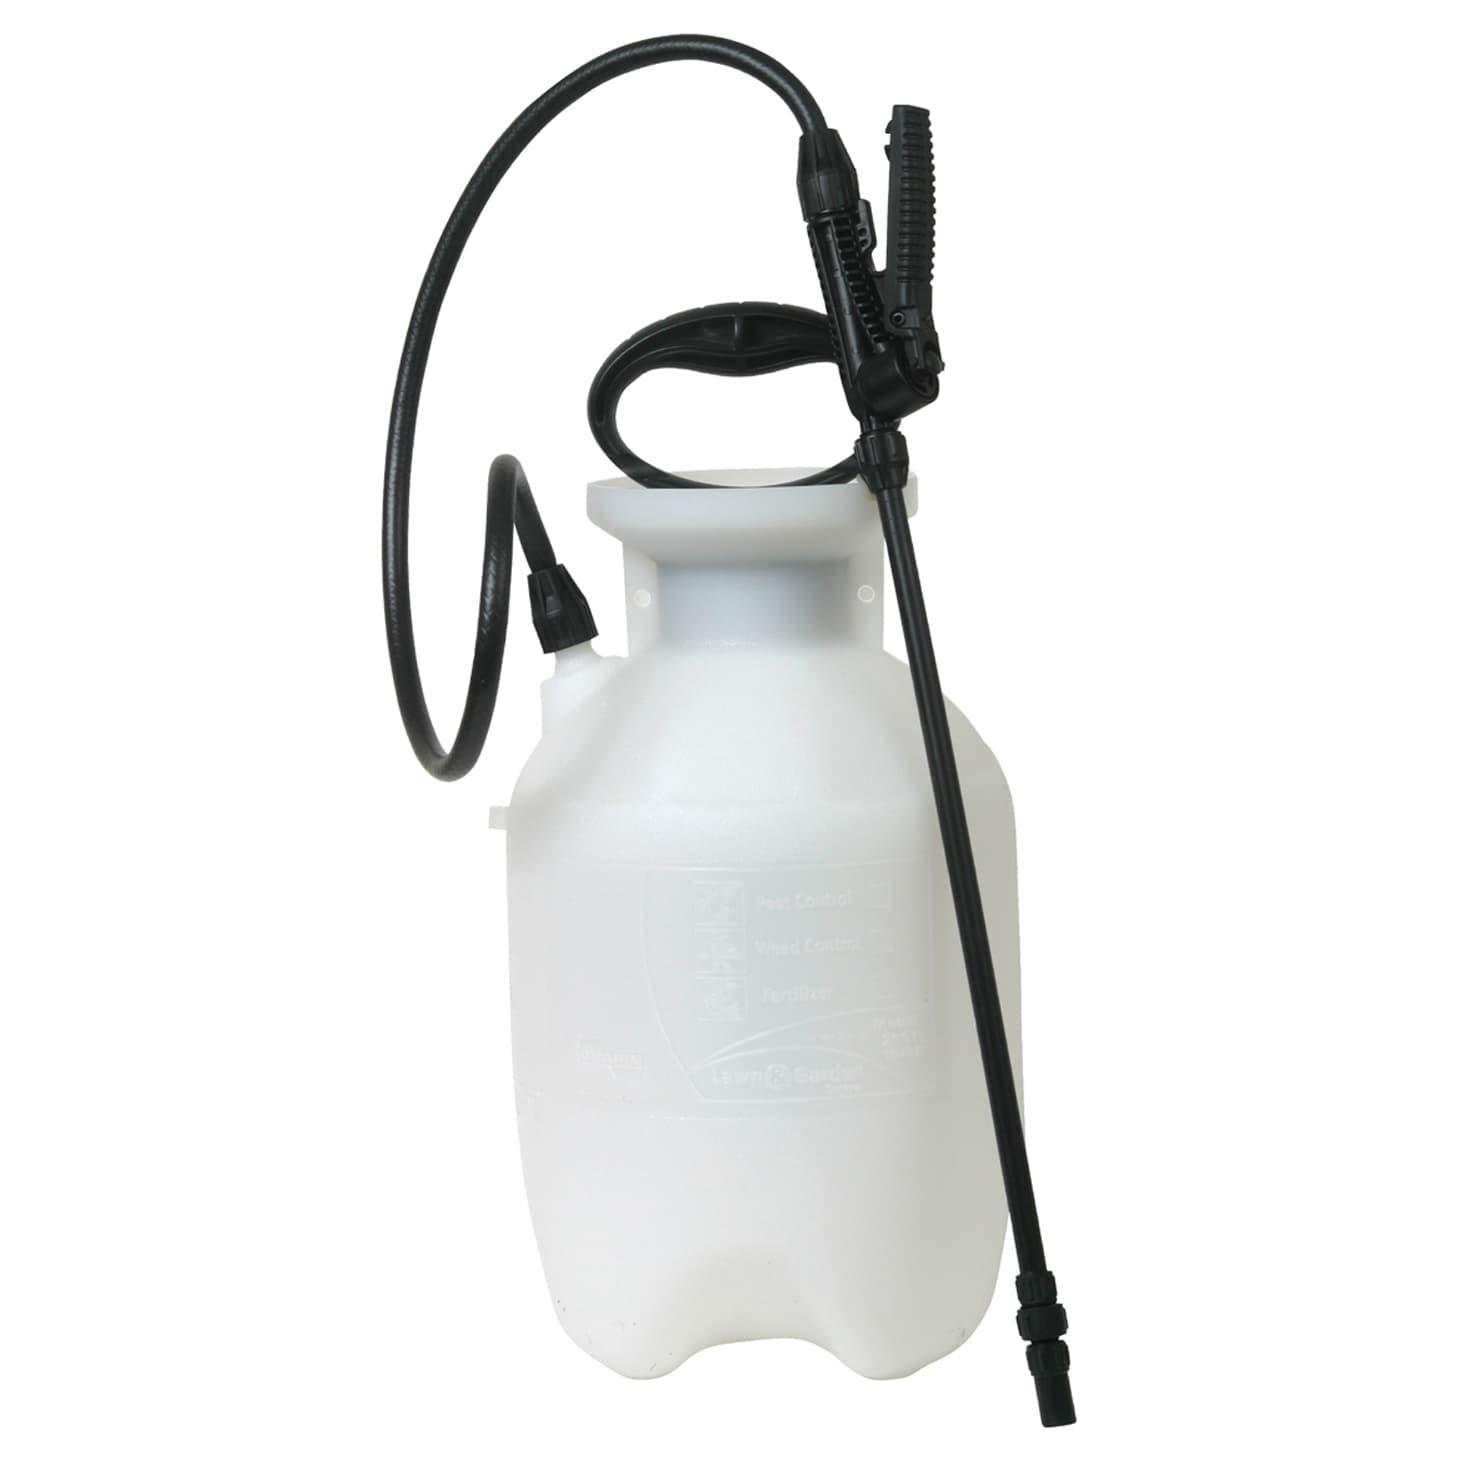 CHAPIN Work White 1-gallon Promotional Sprayer #133956